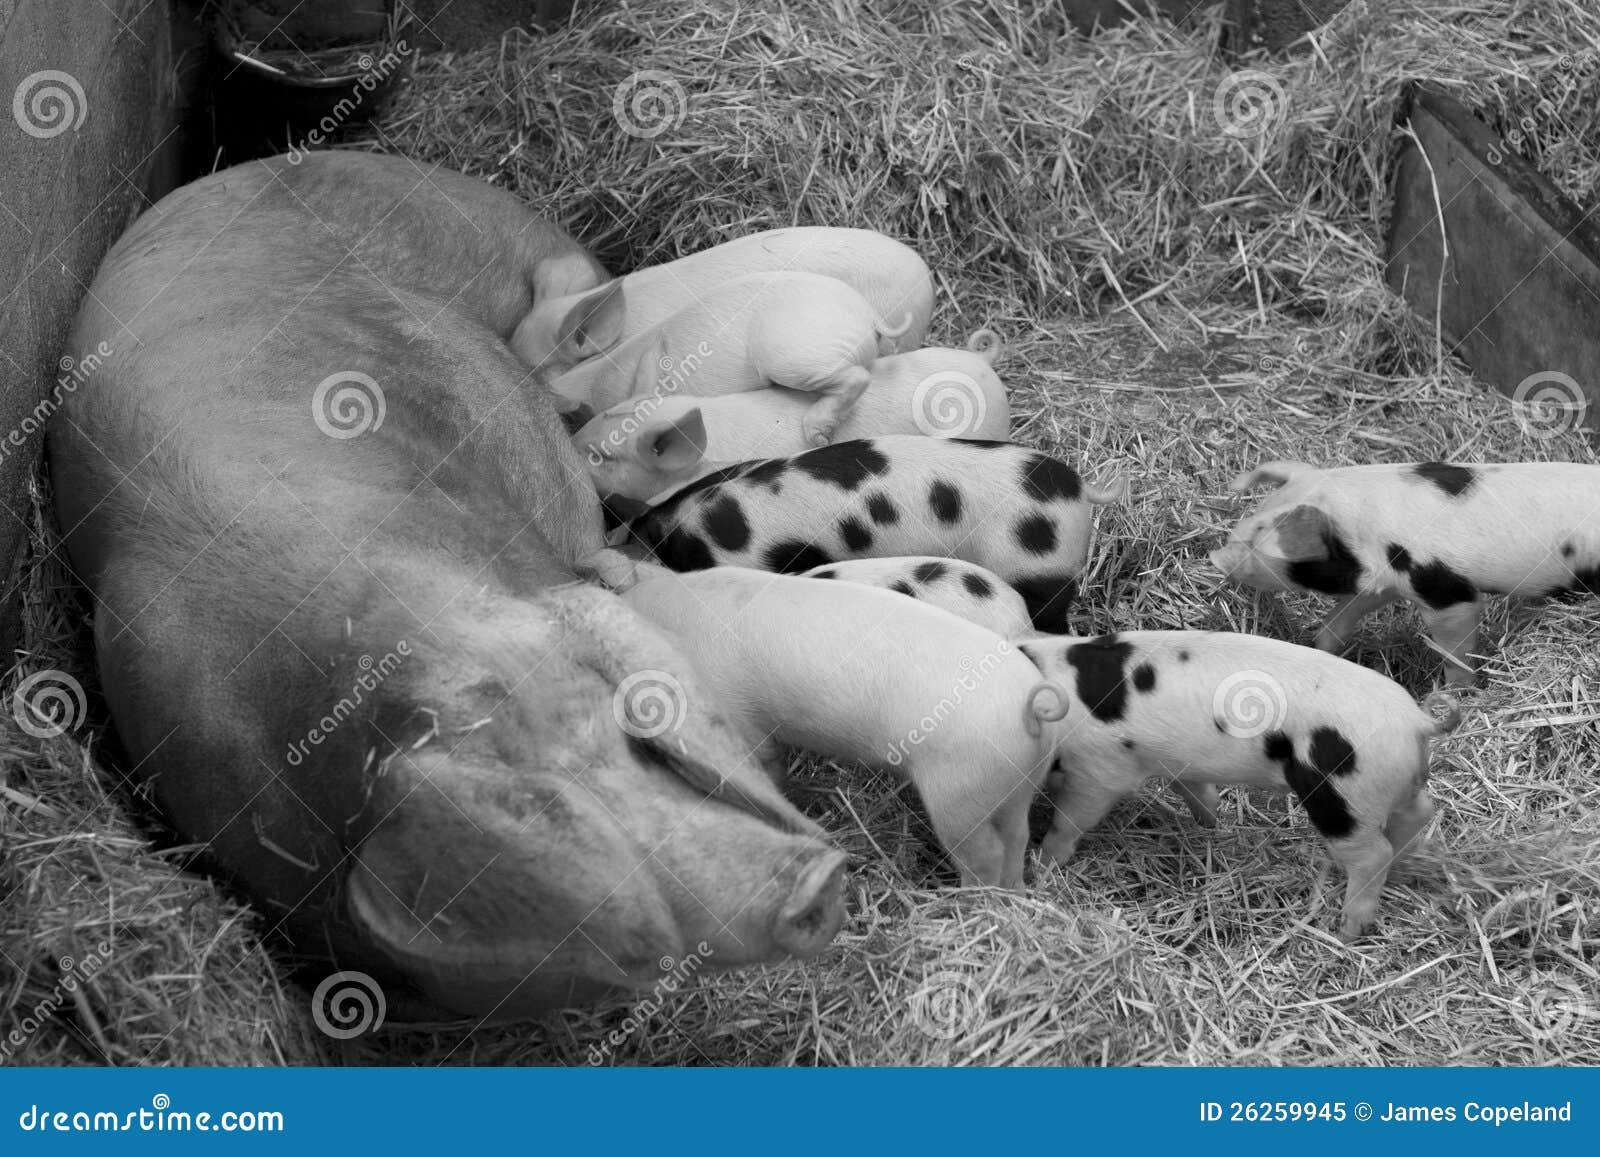 Sow Feeding Babg Piglets Royalty Free Stock Photo Image